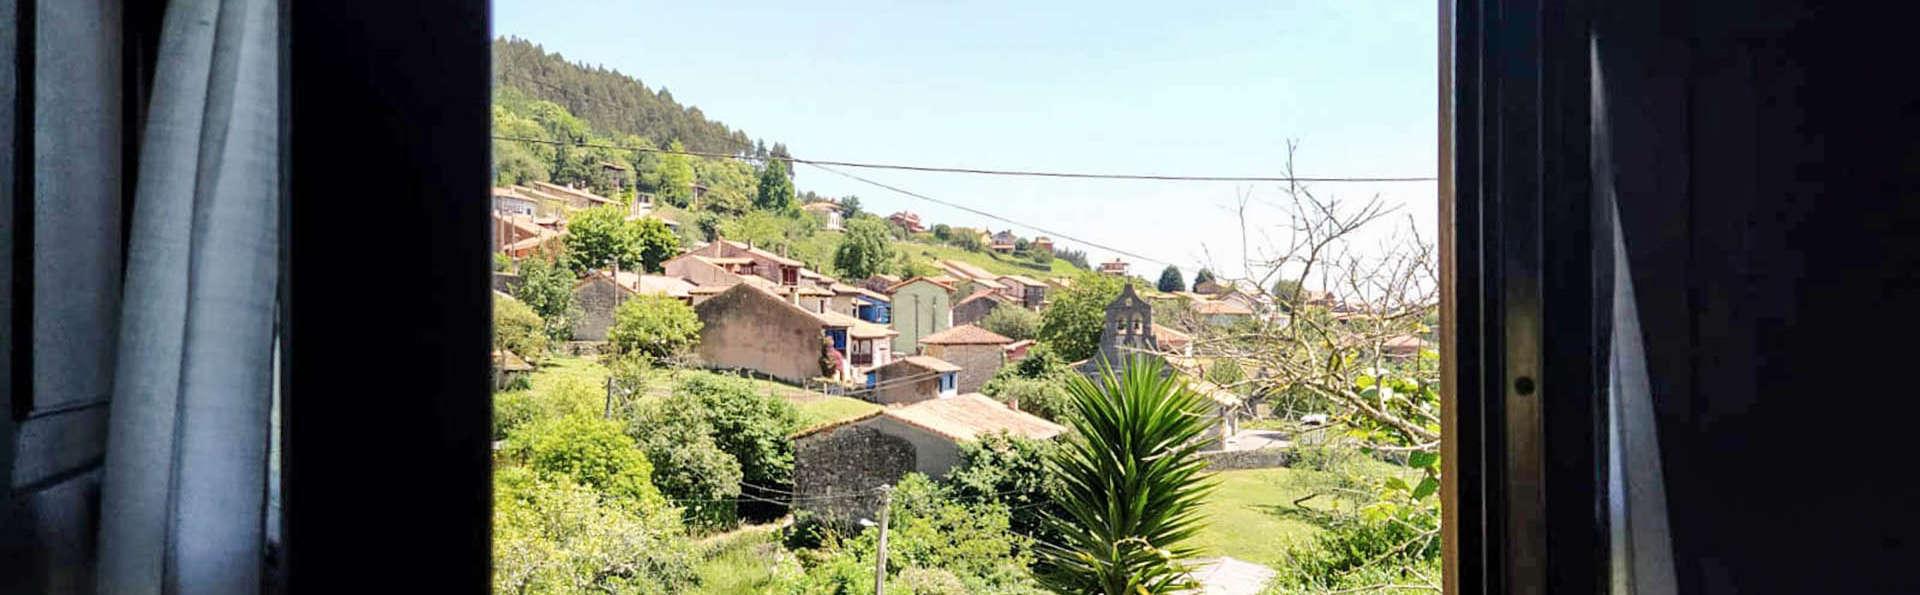 La Casona de Tresgrandas - EDIT_outside_view_02.jpg